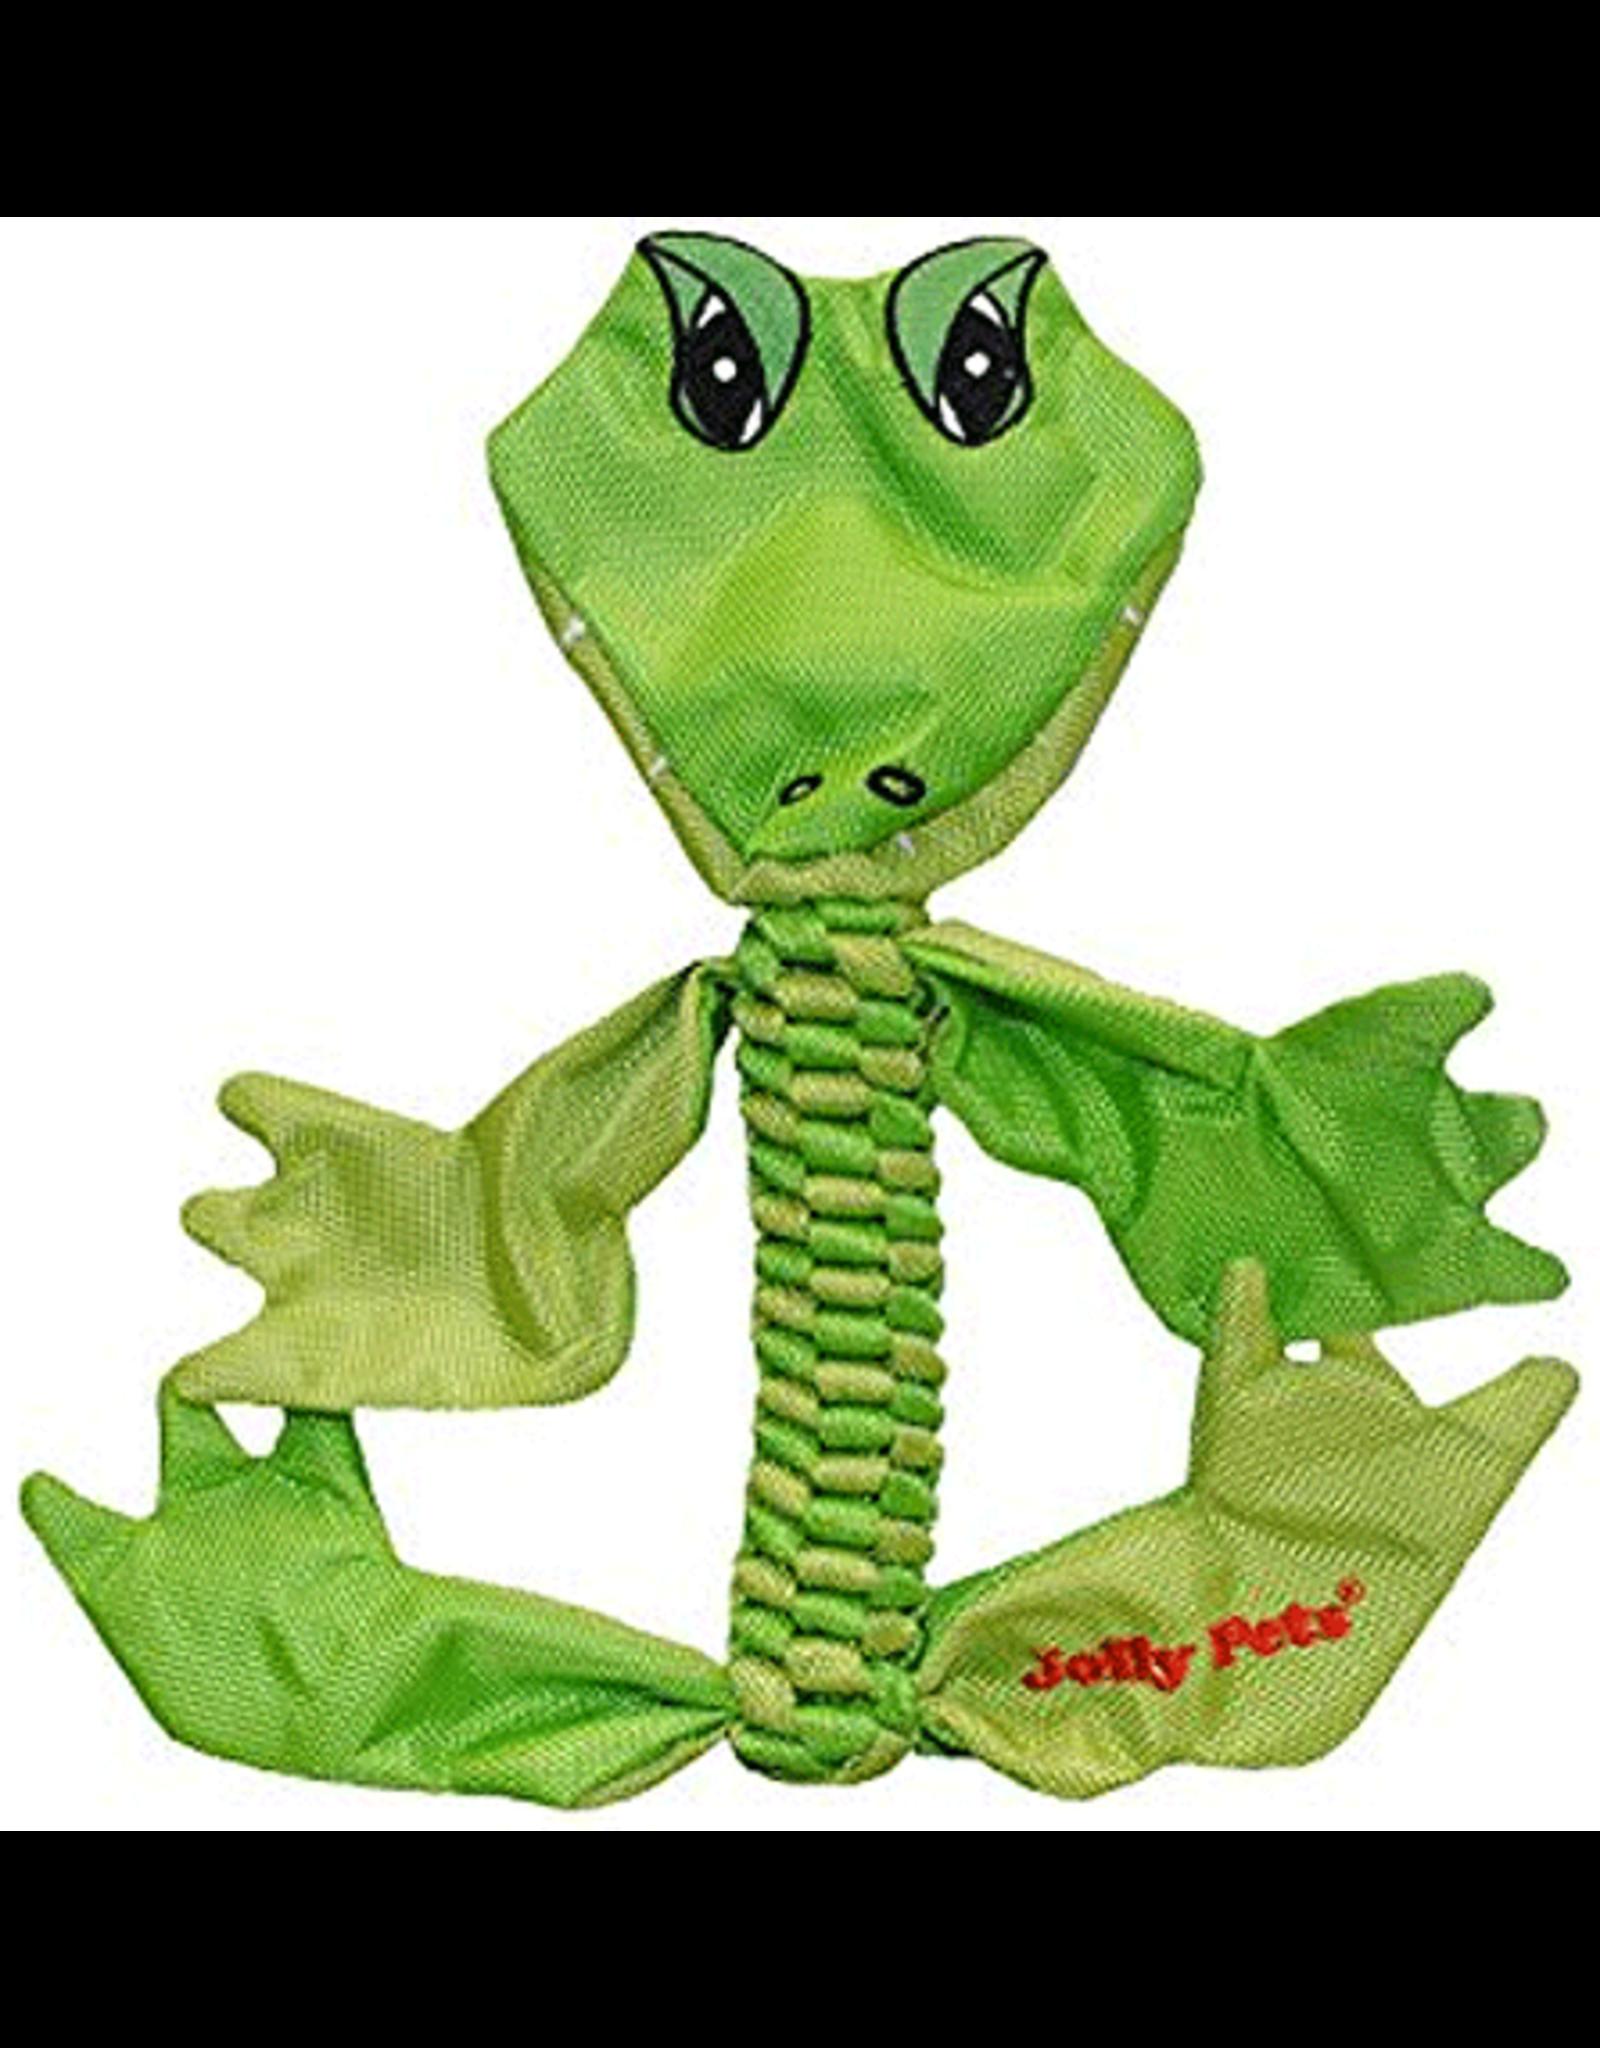 Jolly Pet JOLLYPET Flathead Alligator M